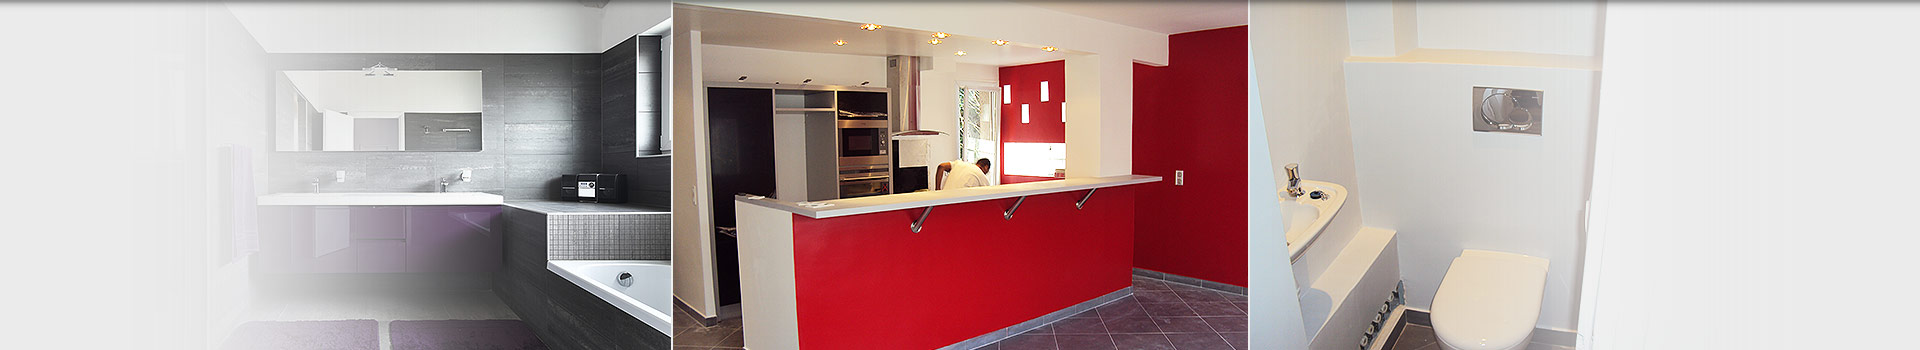 renovation-vincennes-94-appartement